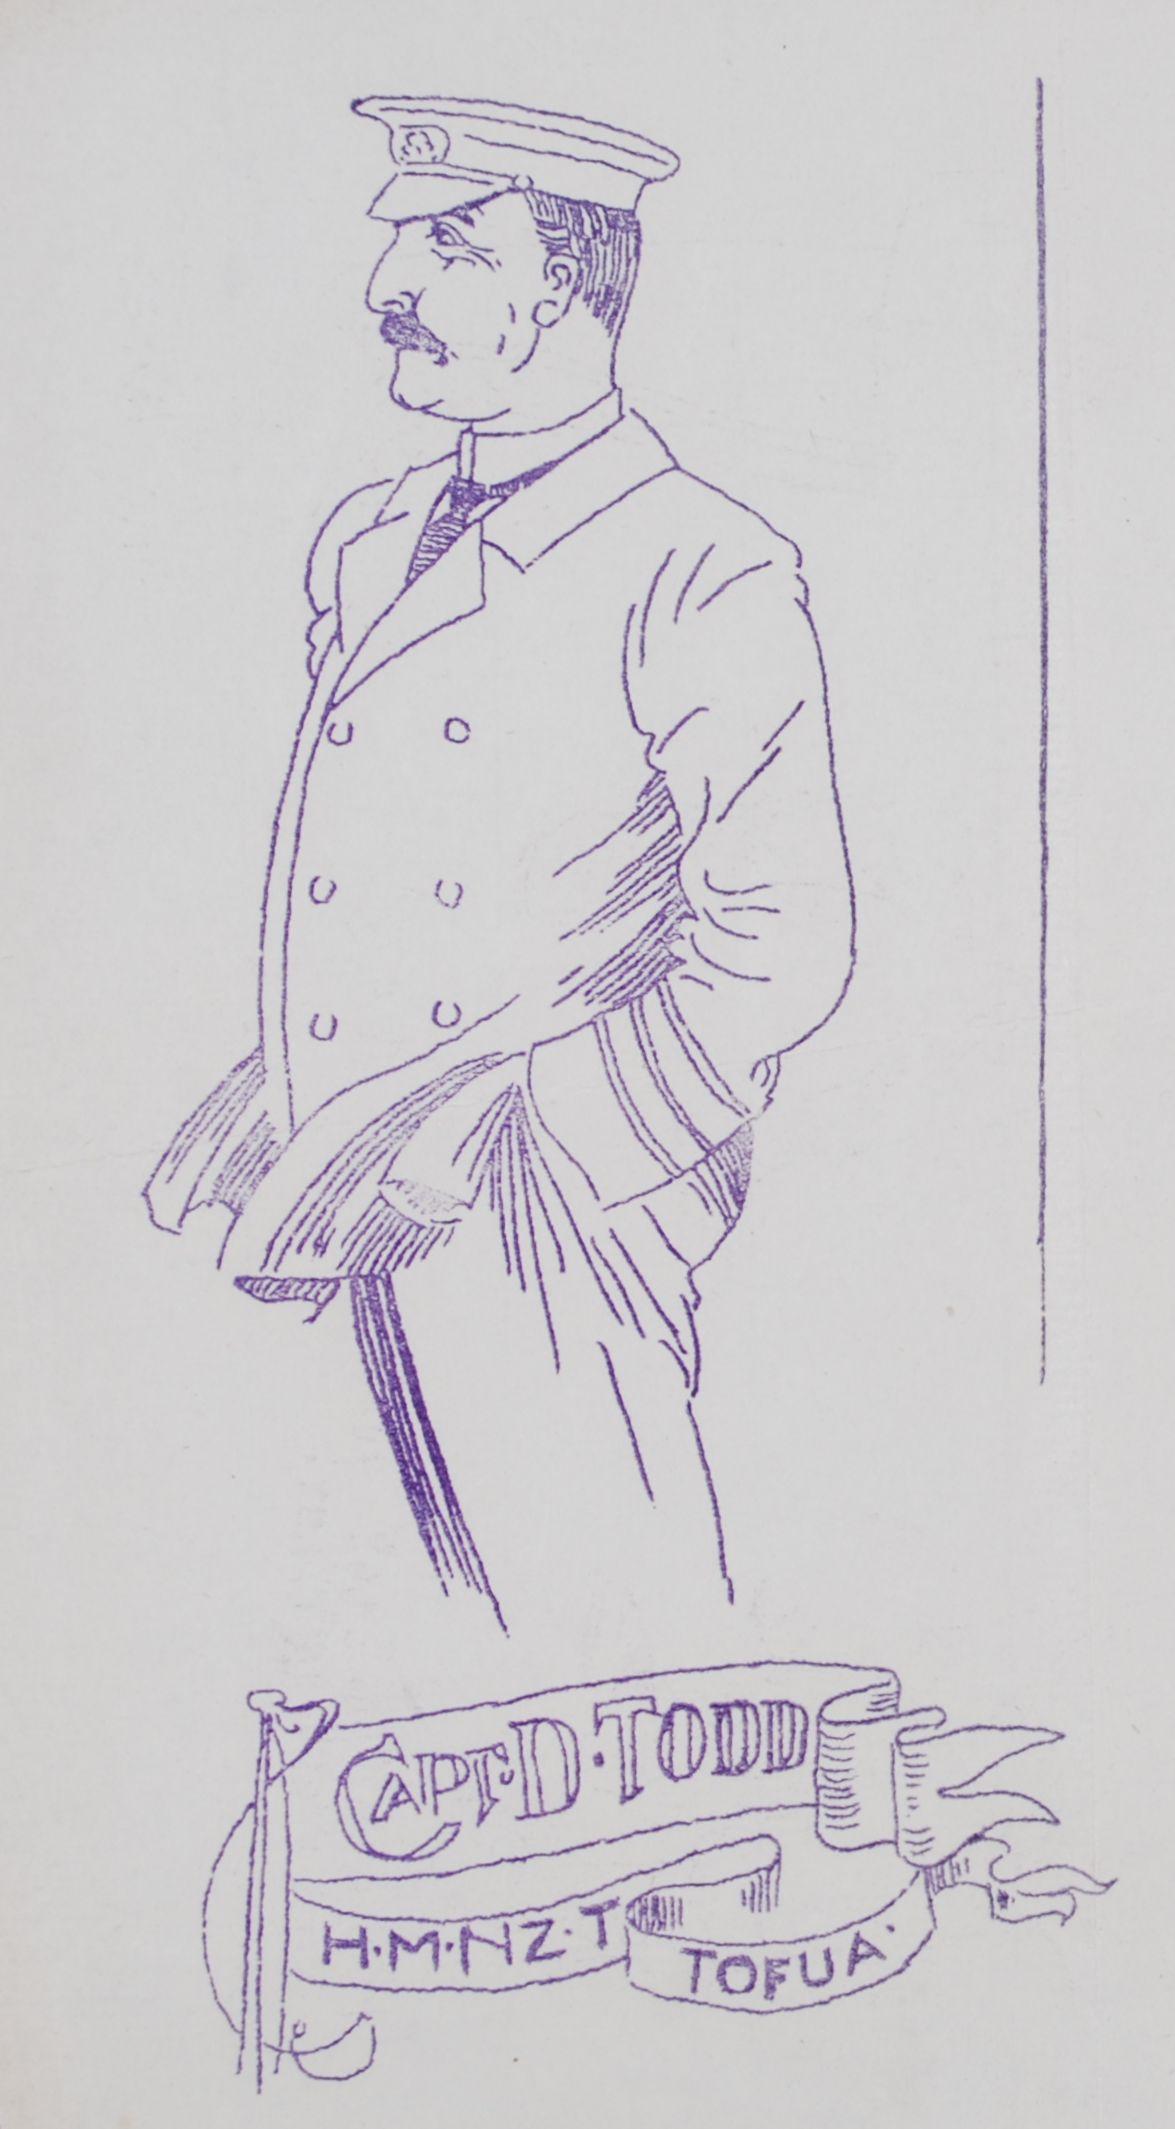 """Sherry"" (Shirreffs McIntyre). Master Drawings for Kiwi Magazine. 1917"